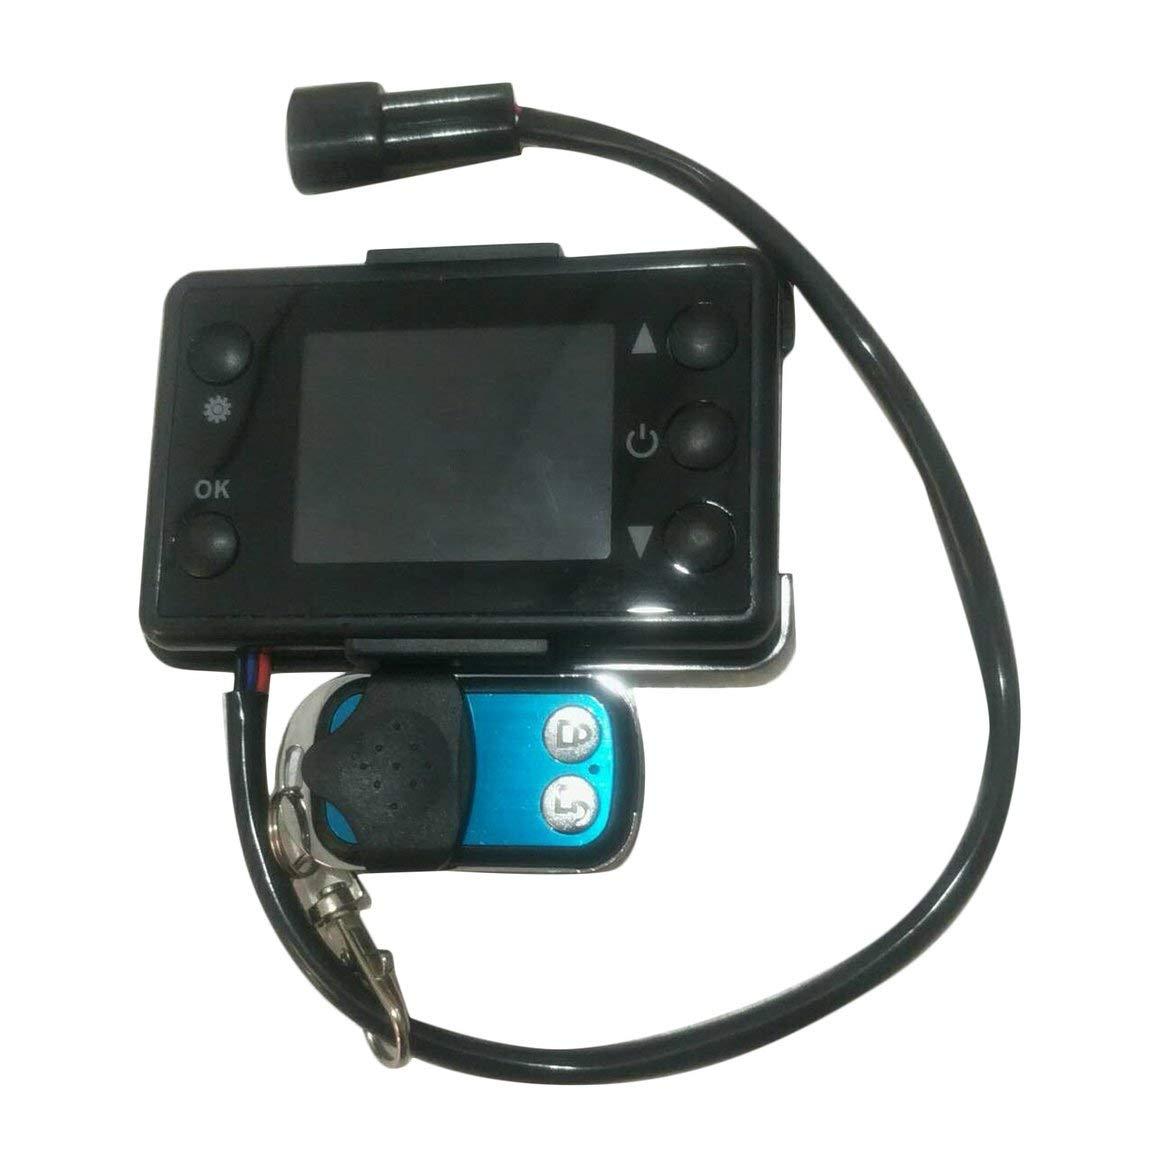 KiGoing 12V/24V LCD Monitor Parking Heater Switch Heater ...